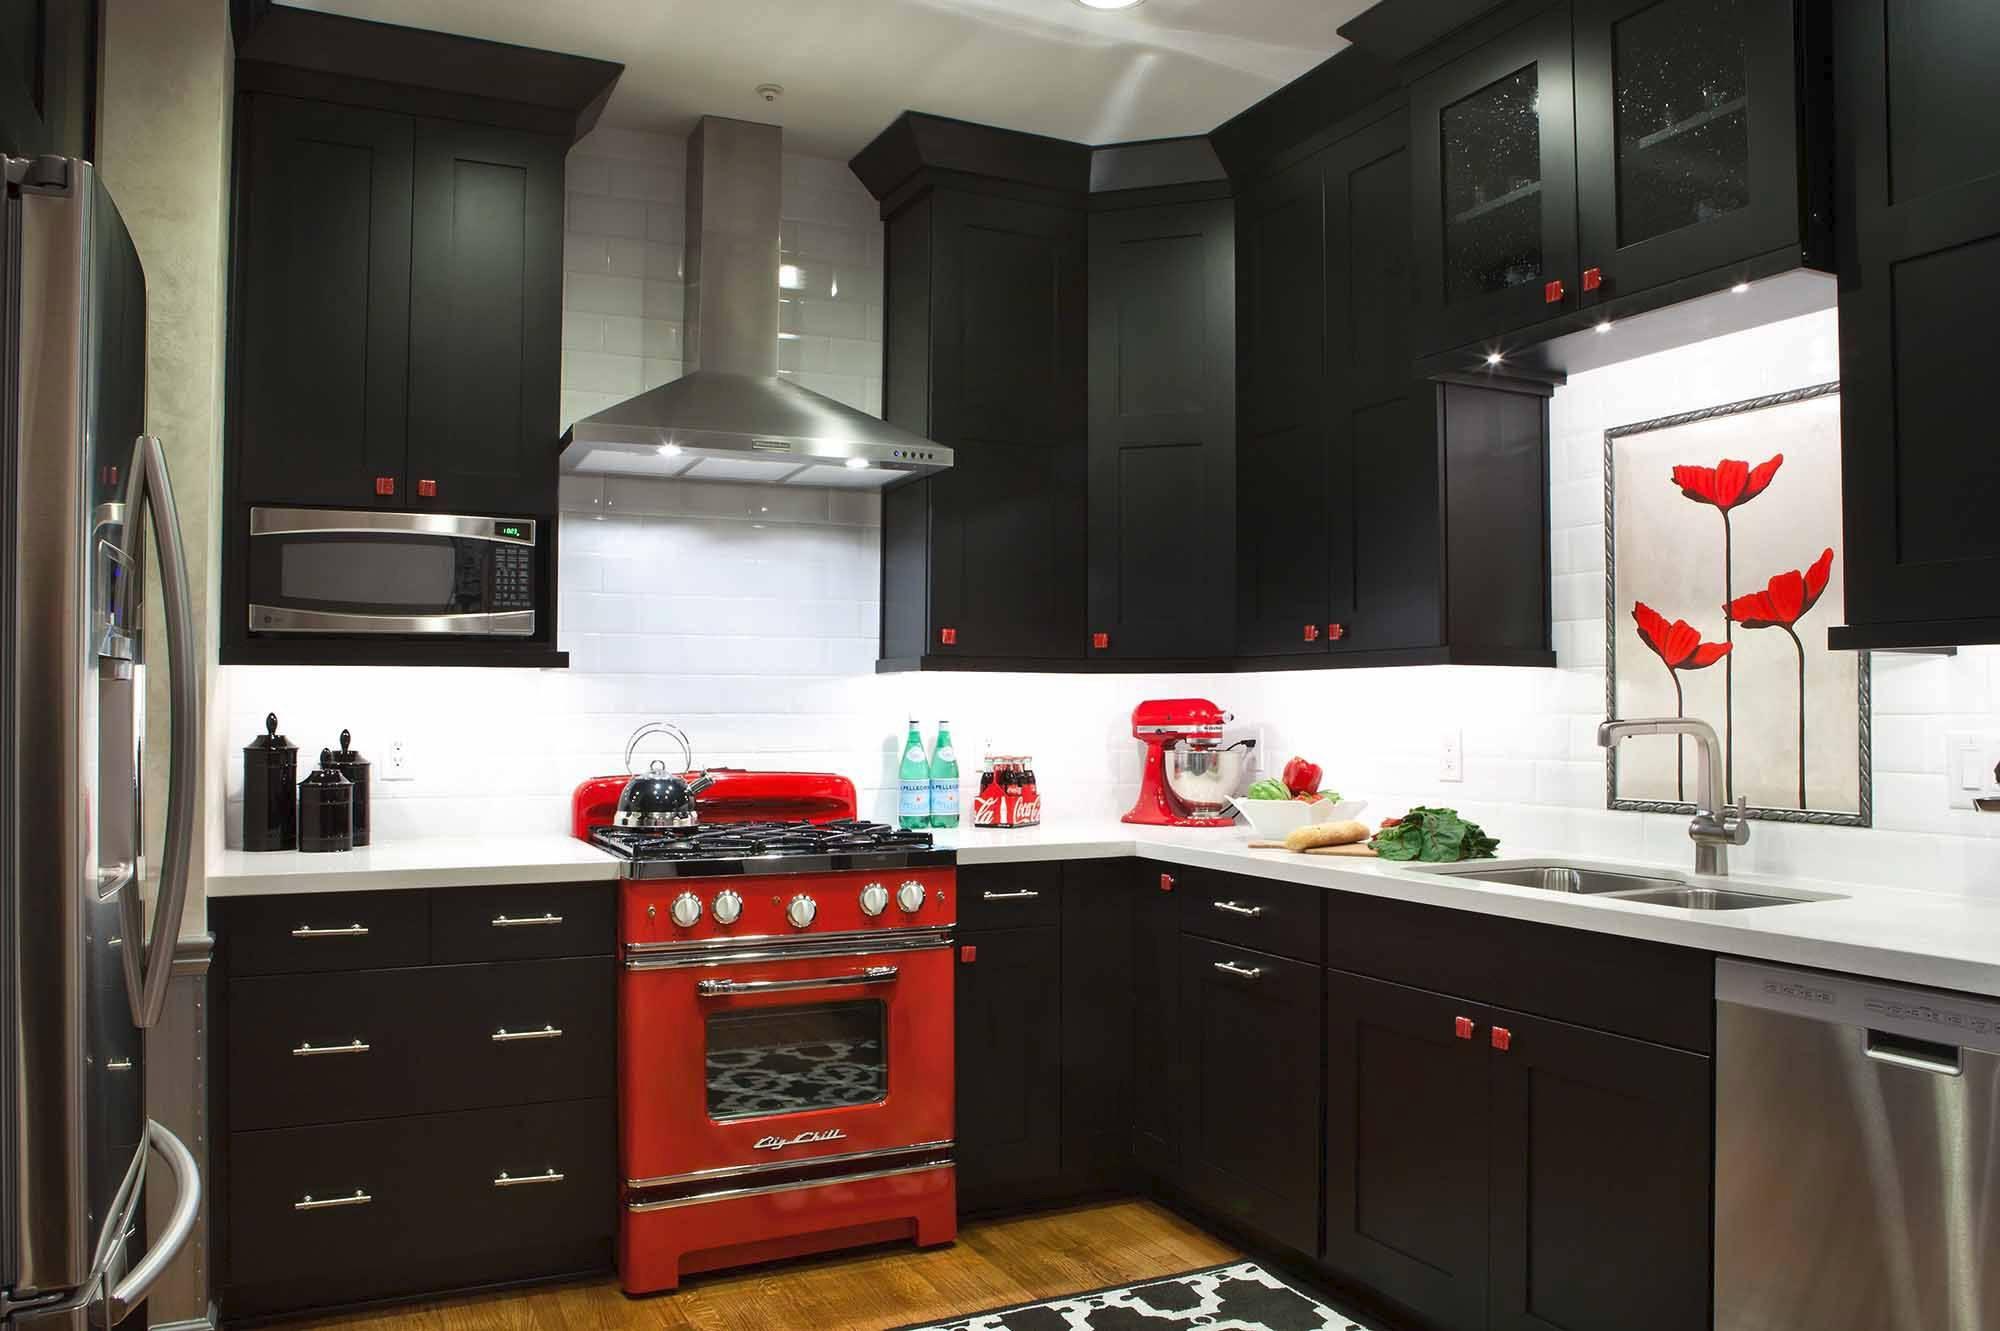 A 14 By 12 Foot Atlanta Kitchen Designed By Kandrac U0026 Kole Interior